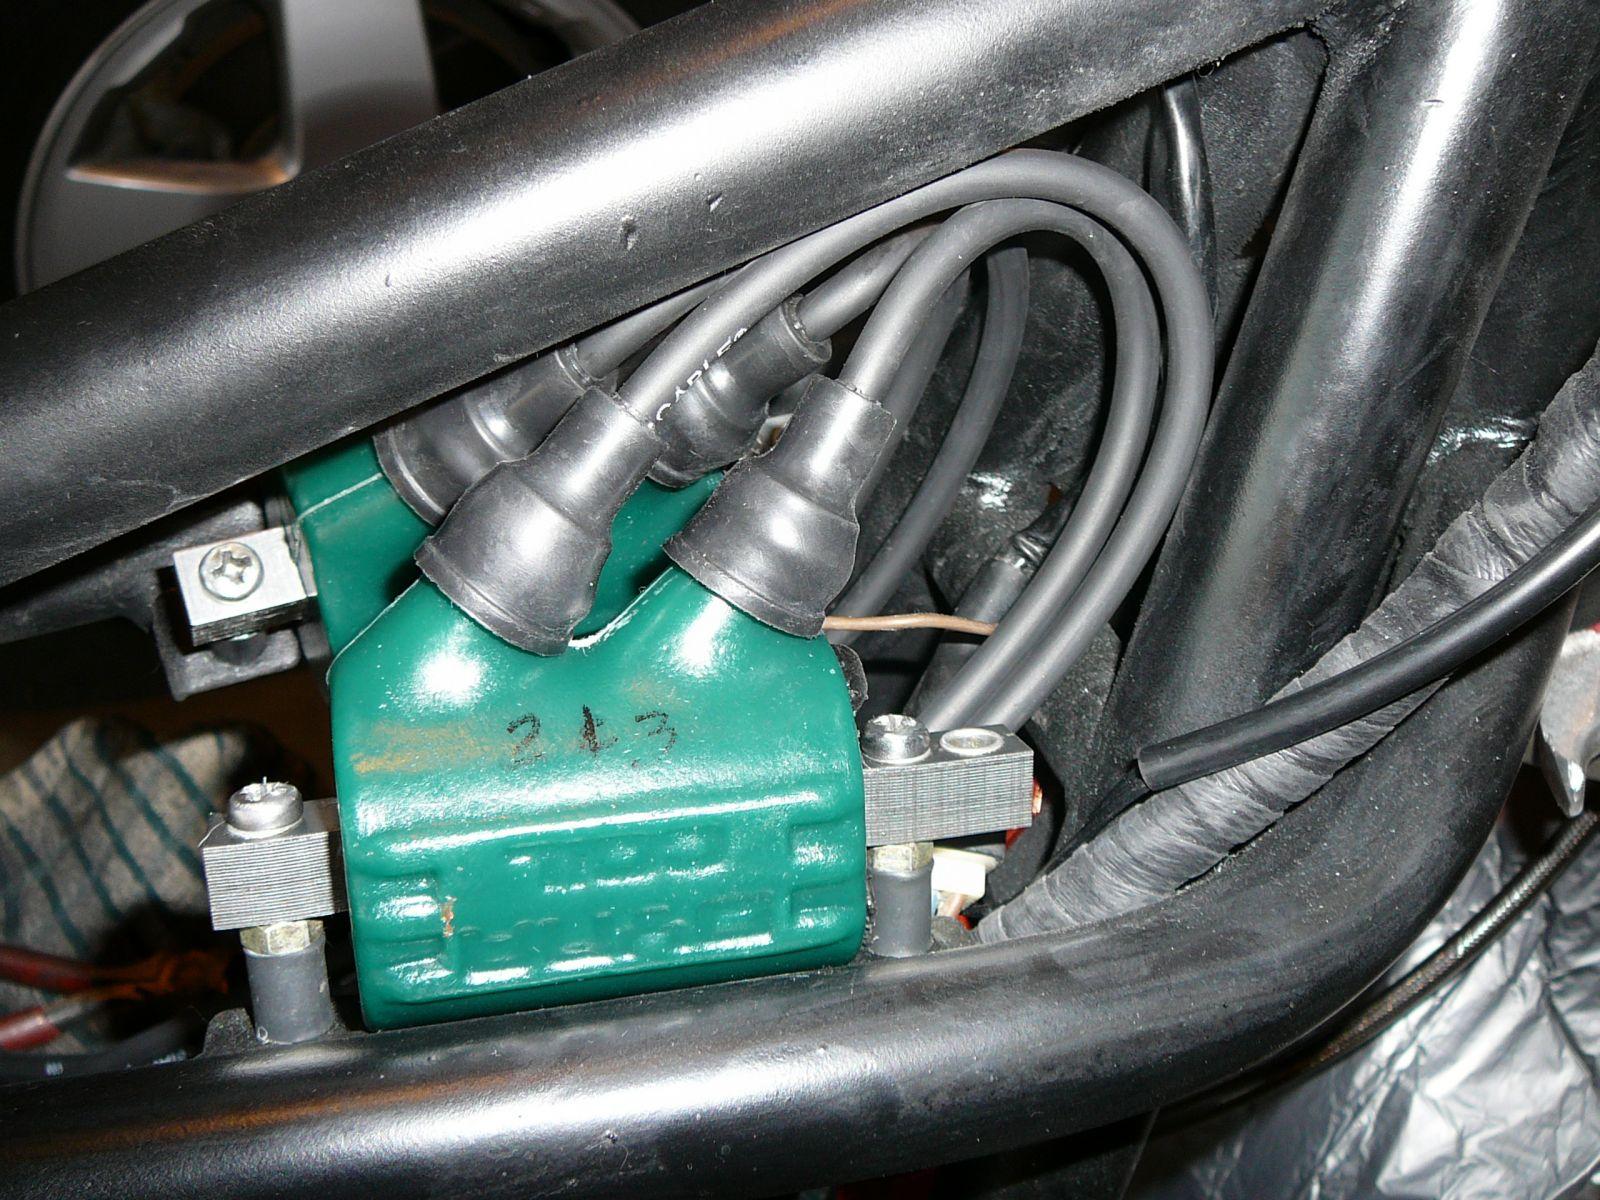 1982 kz1000 wiring diagram hvac electrical symbols 1979 dyna coil kzrider forum kz